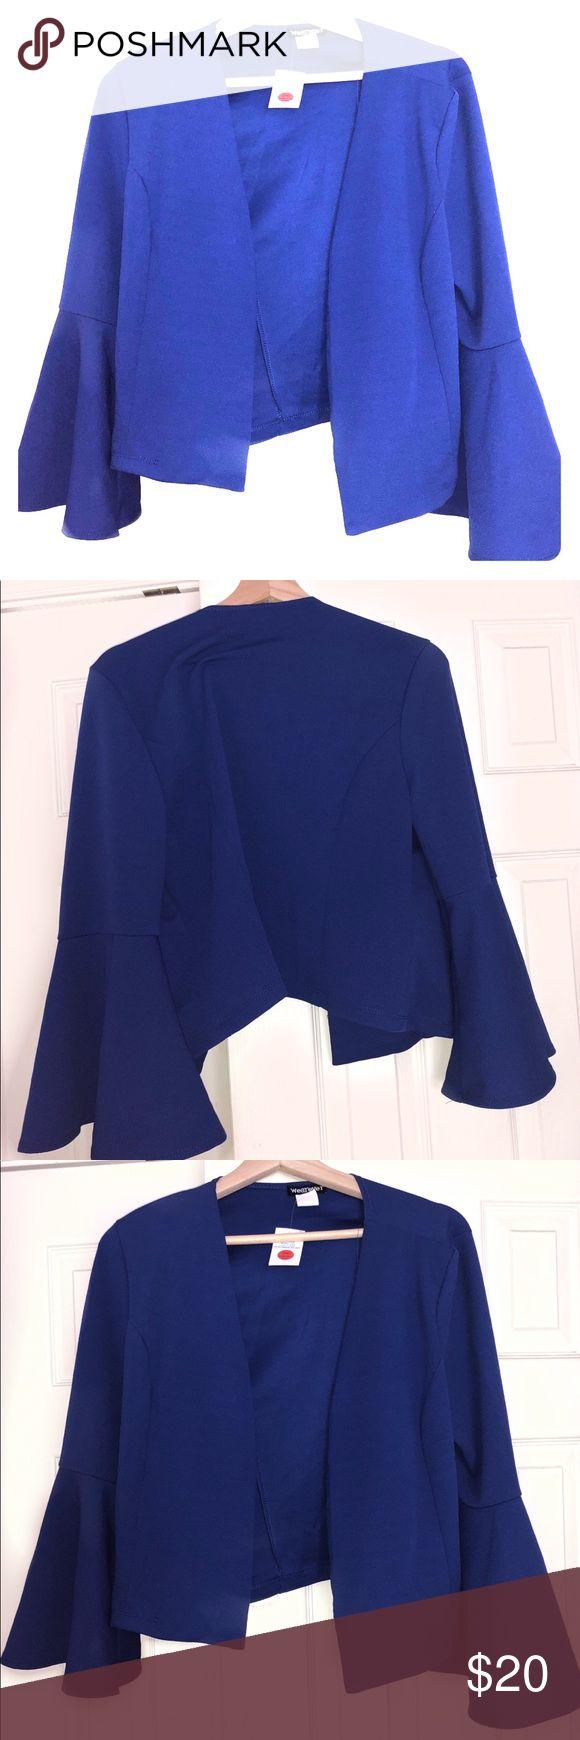 Royal Blue Blazer Royal Blue Blaszer. Fits at waist. Flare sleeves. Jackets & Coats Blazers